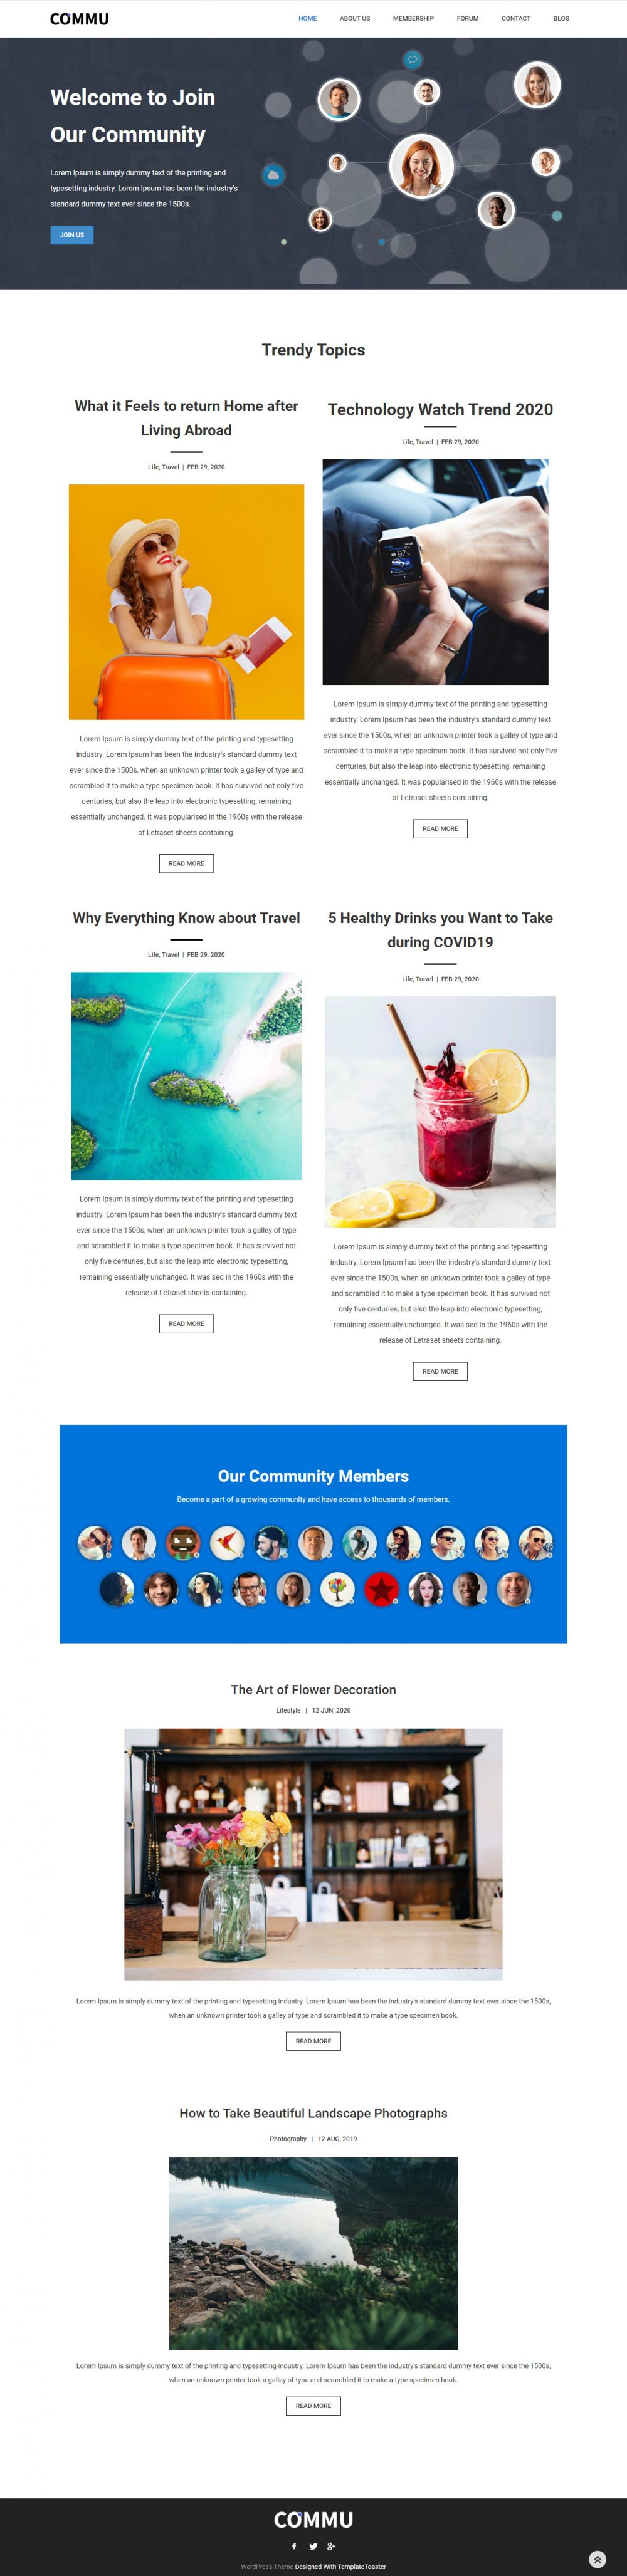 Commu - Social Networking & Community WordPress Theme